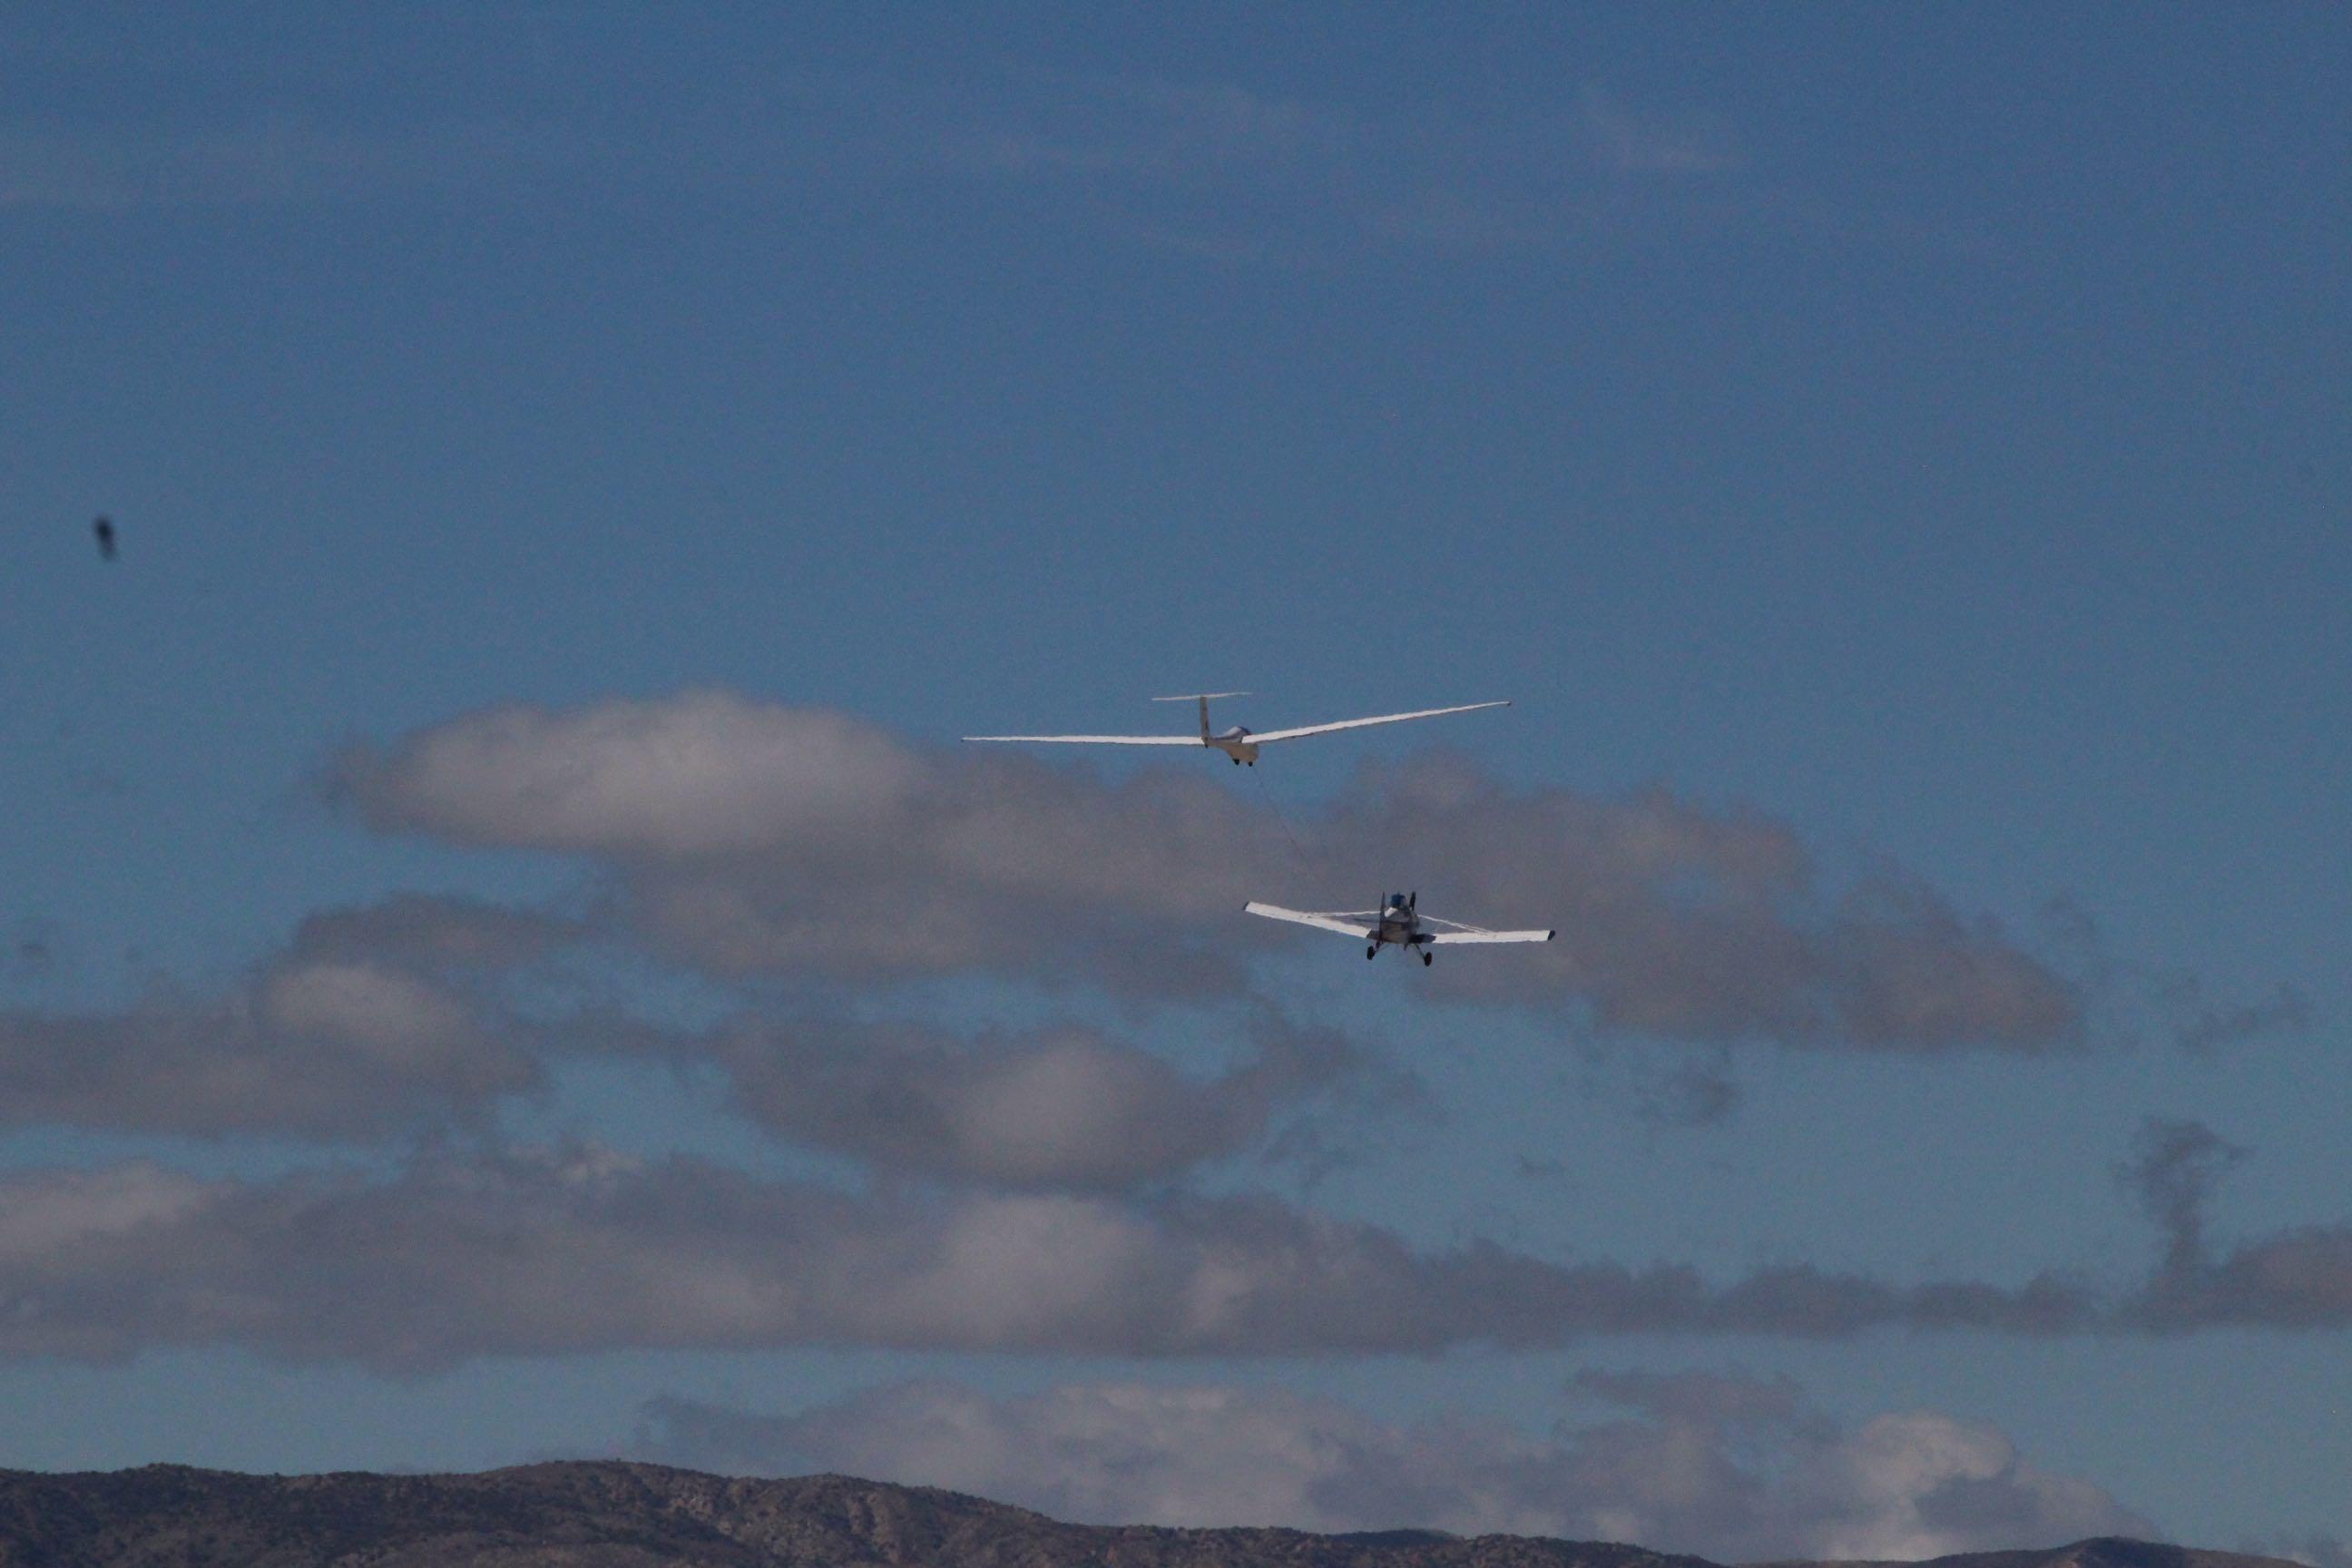 The Sky's the Limit for SCVi Glider Students - Santa Clarita